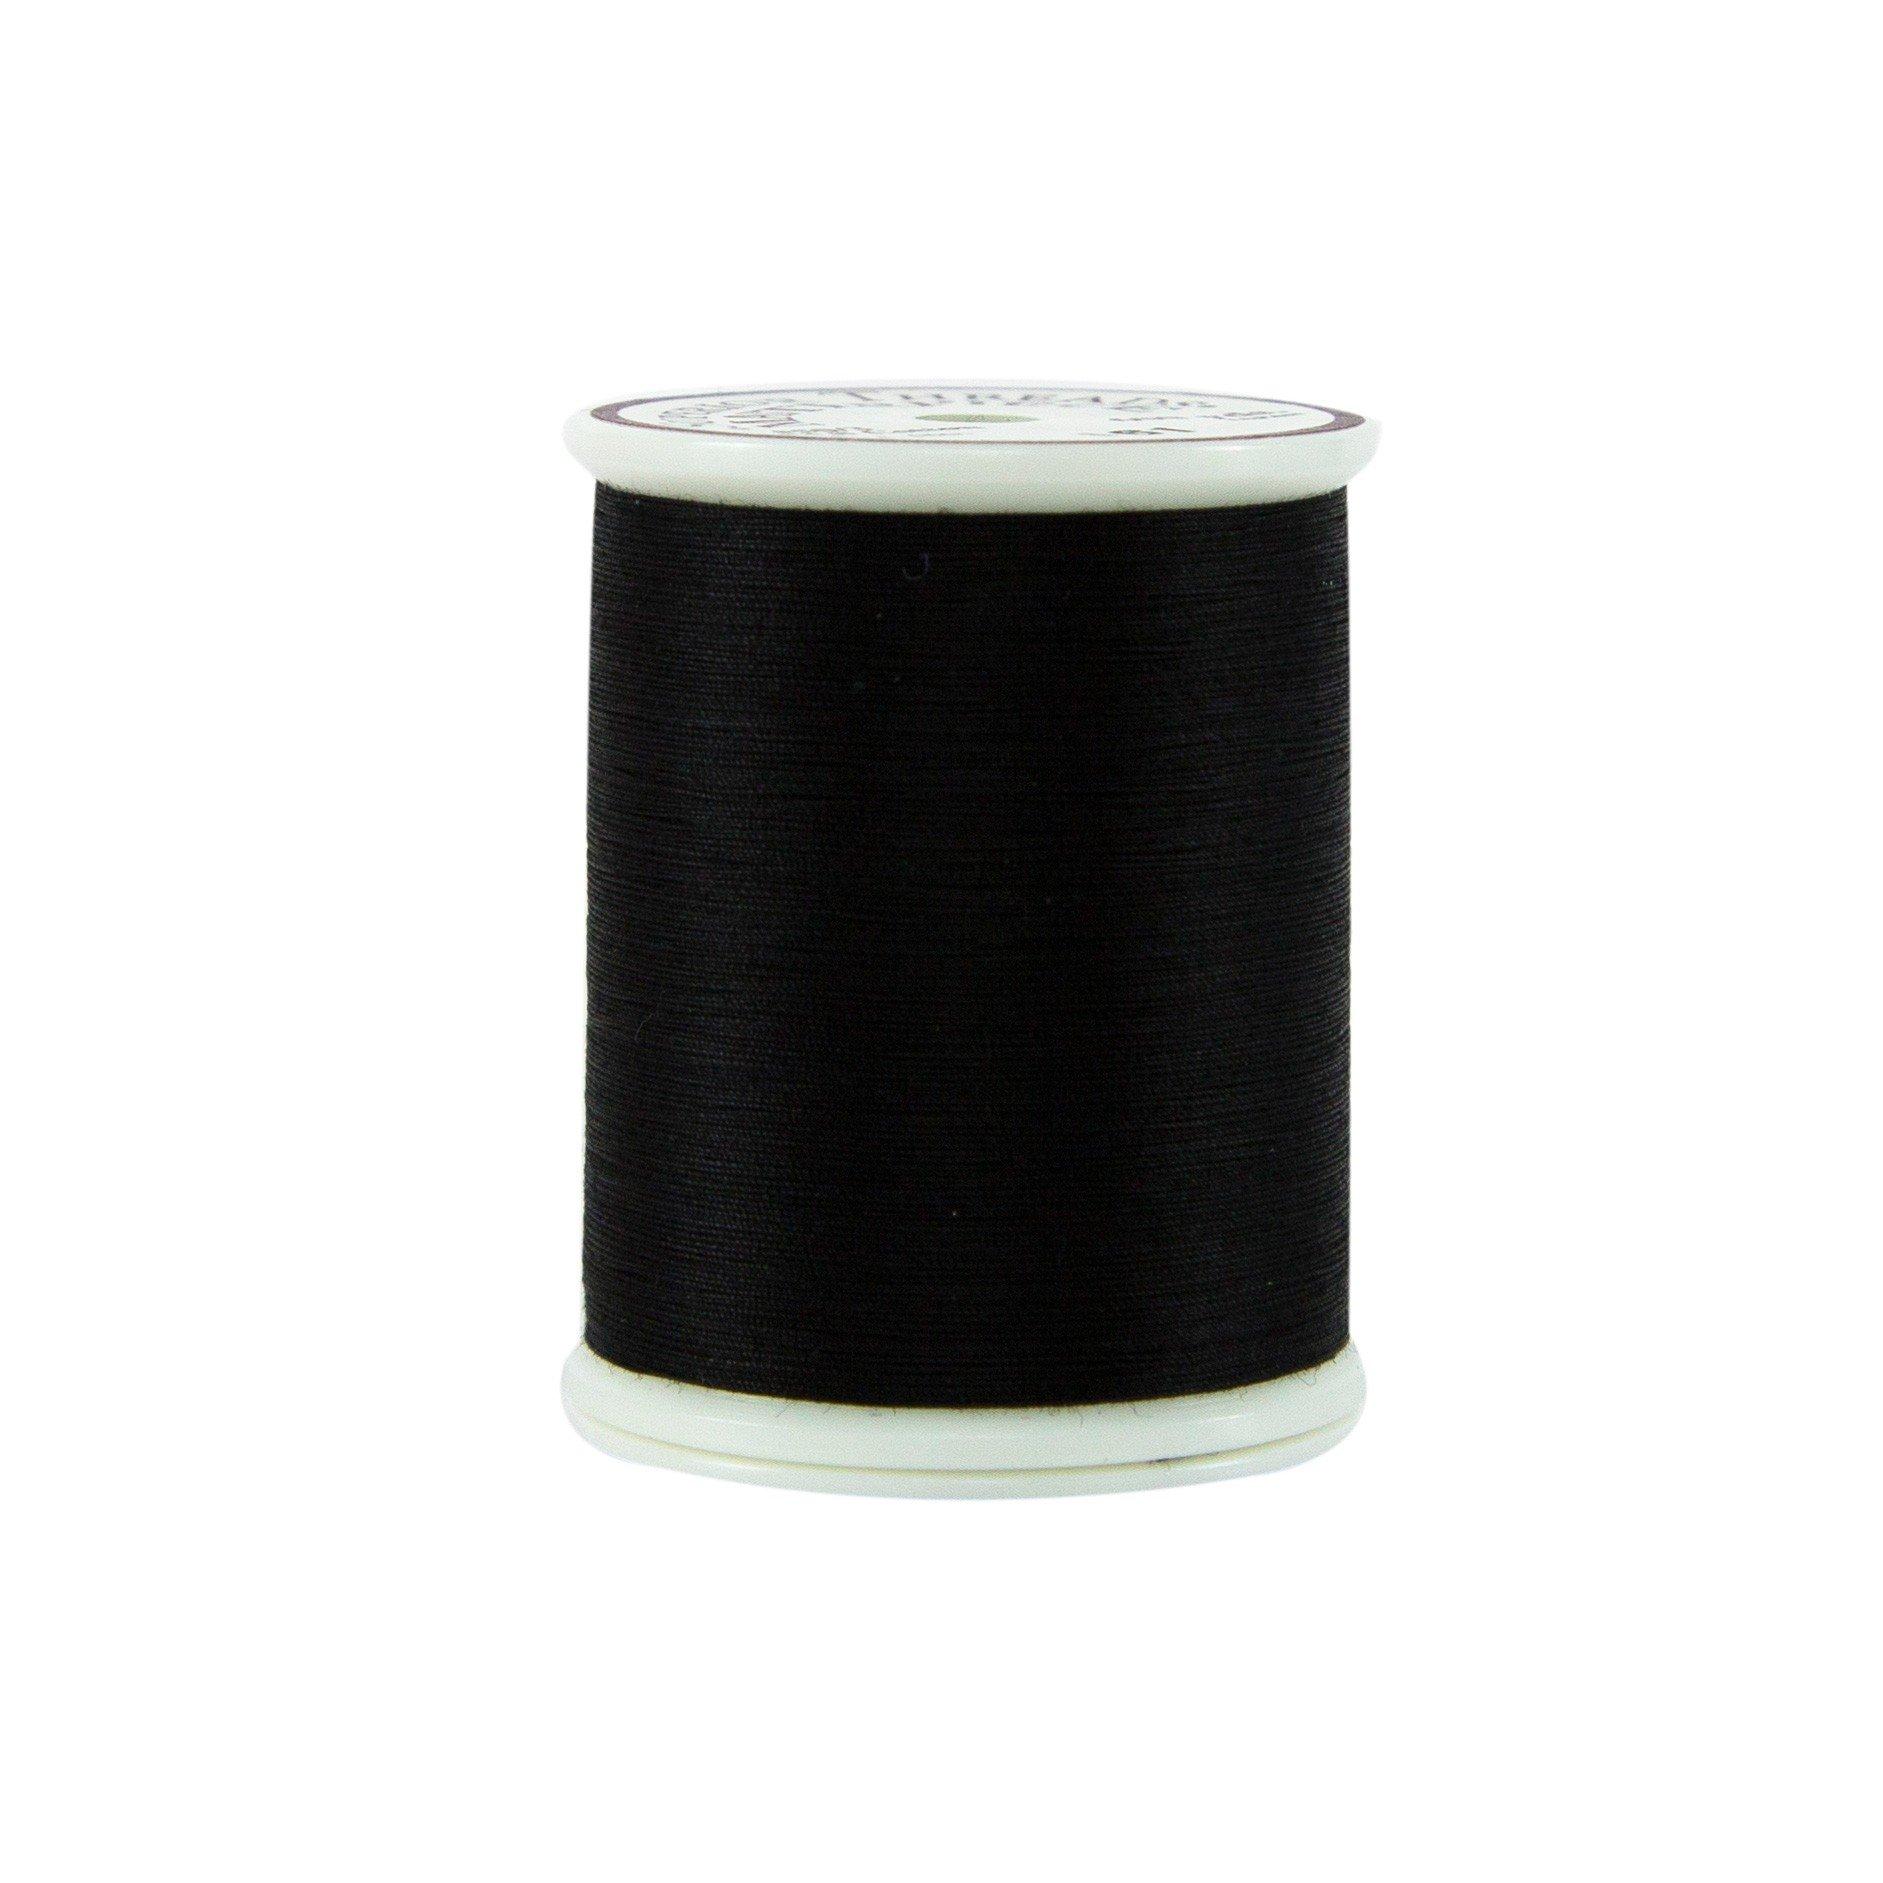 MasterPiece Cotton Thread 50wt - Raven